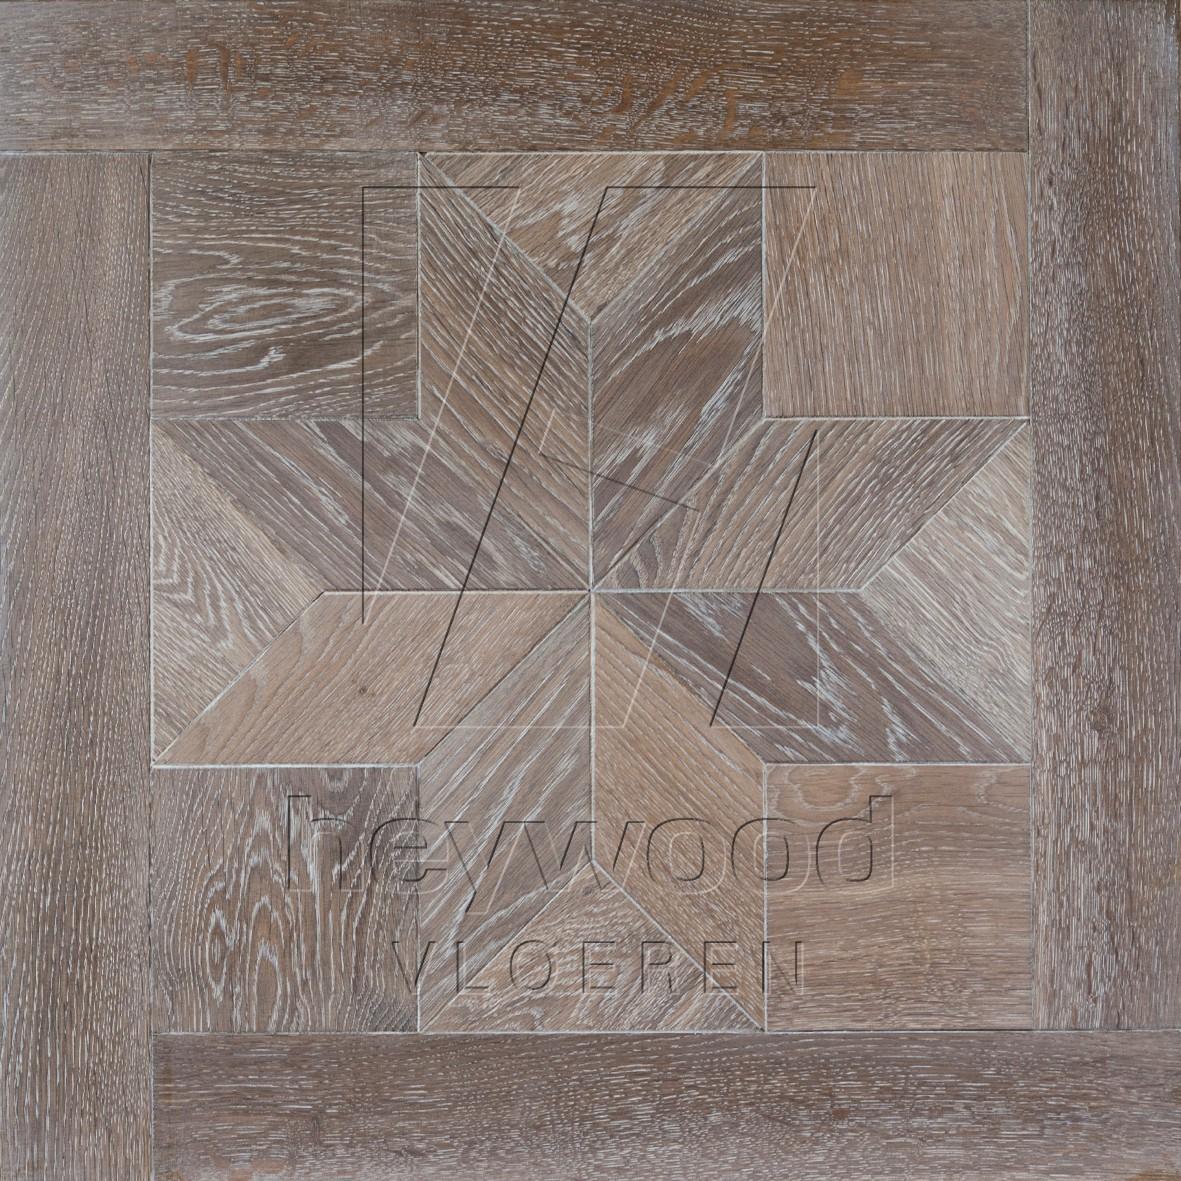 Etoile 660 x 660 mm in Floor Panels & 3D Wall Panels of Pattern & Panel Floors